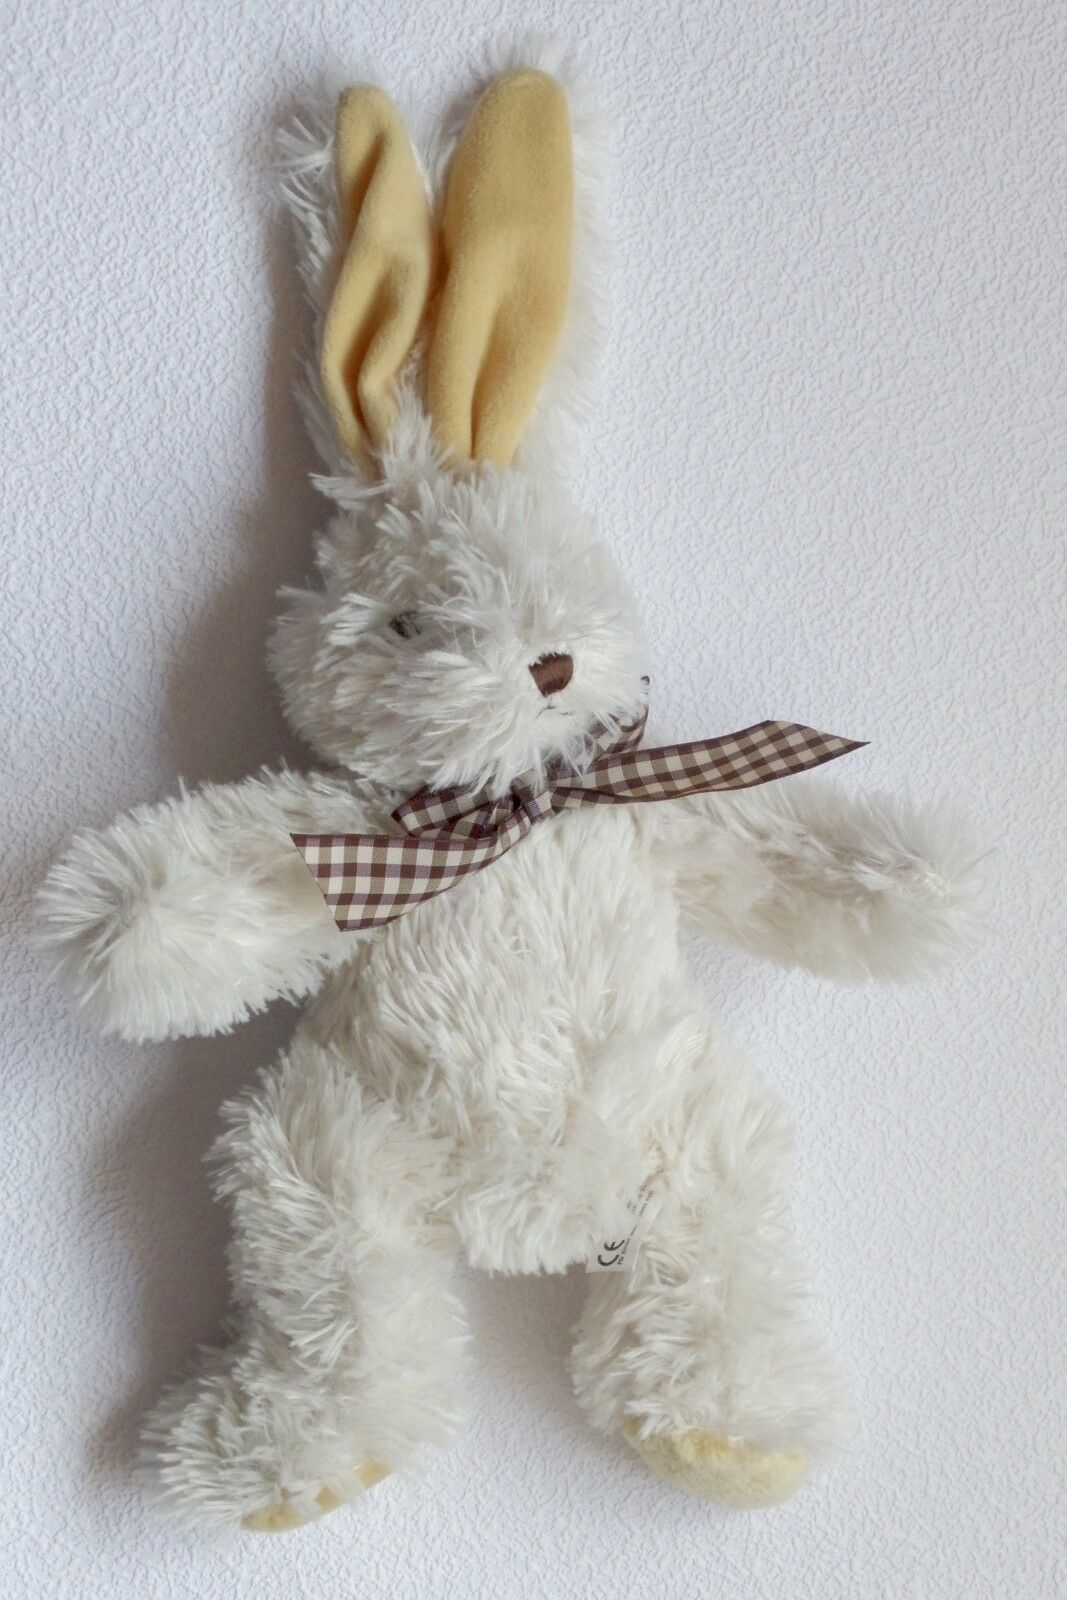 G. Wurm Hase weiß Bunny - Hasi karierte Fliege - Bunny  Ohrenspitze 41 cm Granulatpopo  24aa09